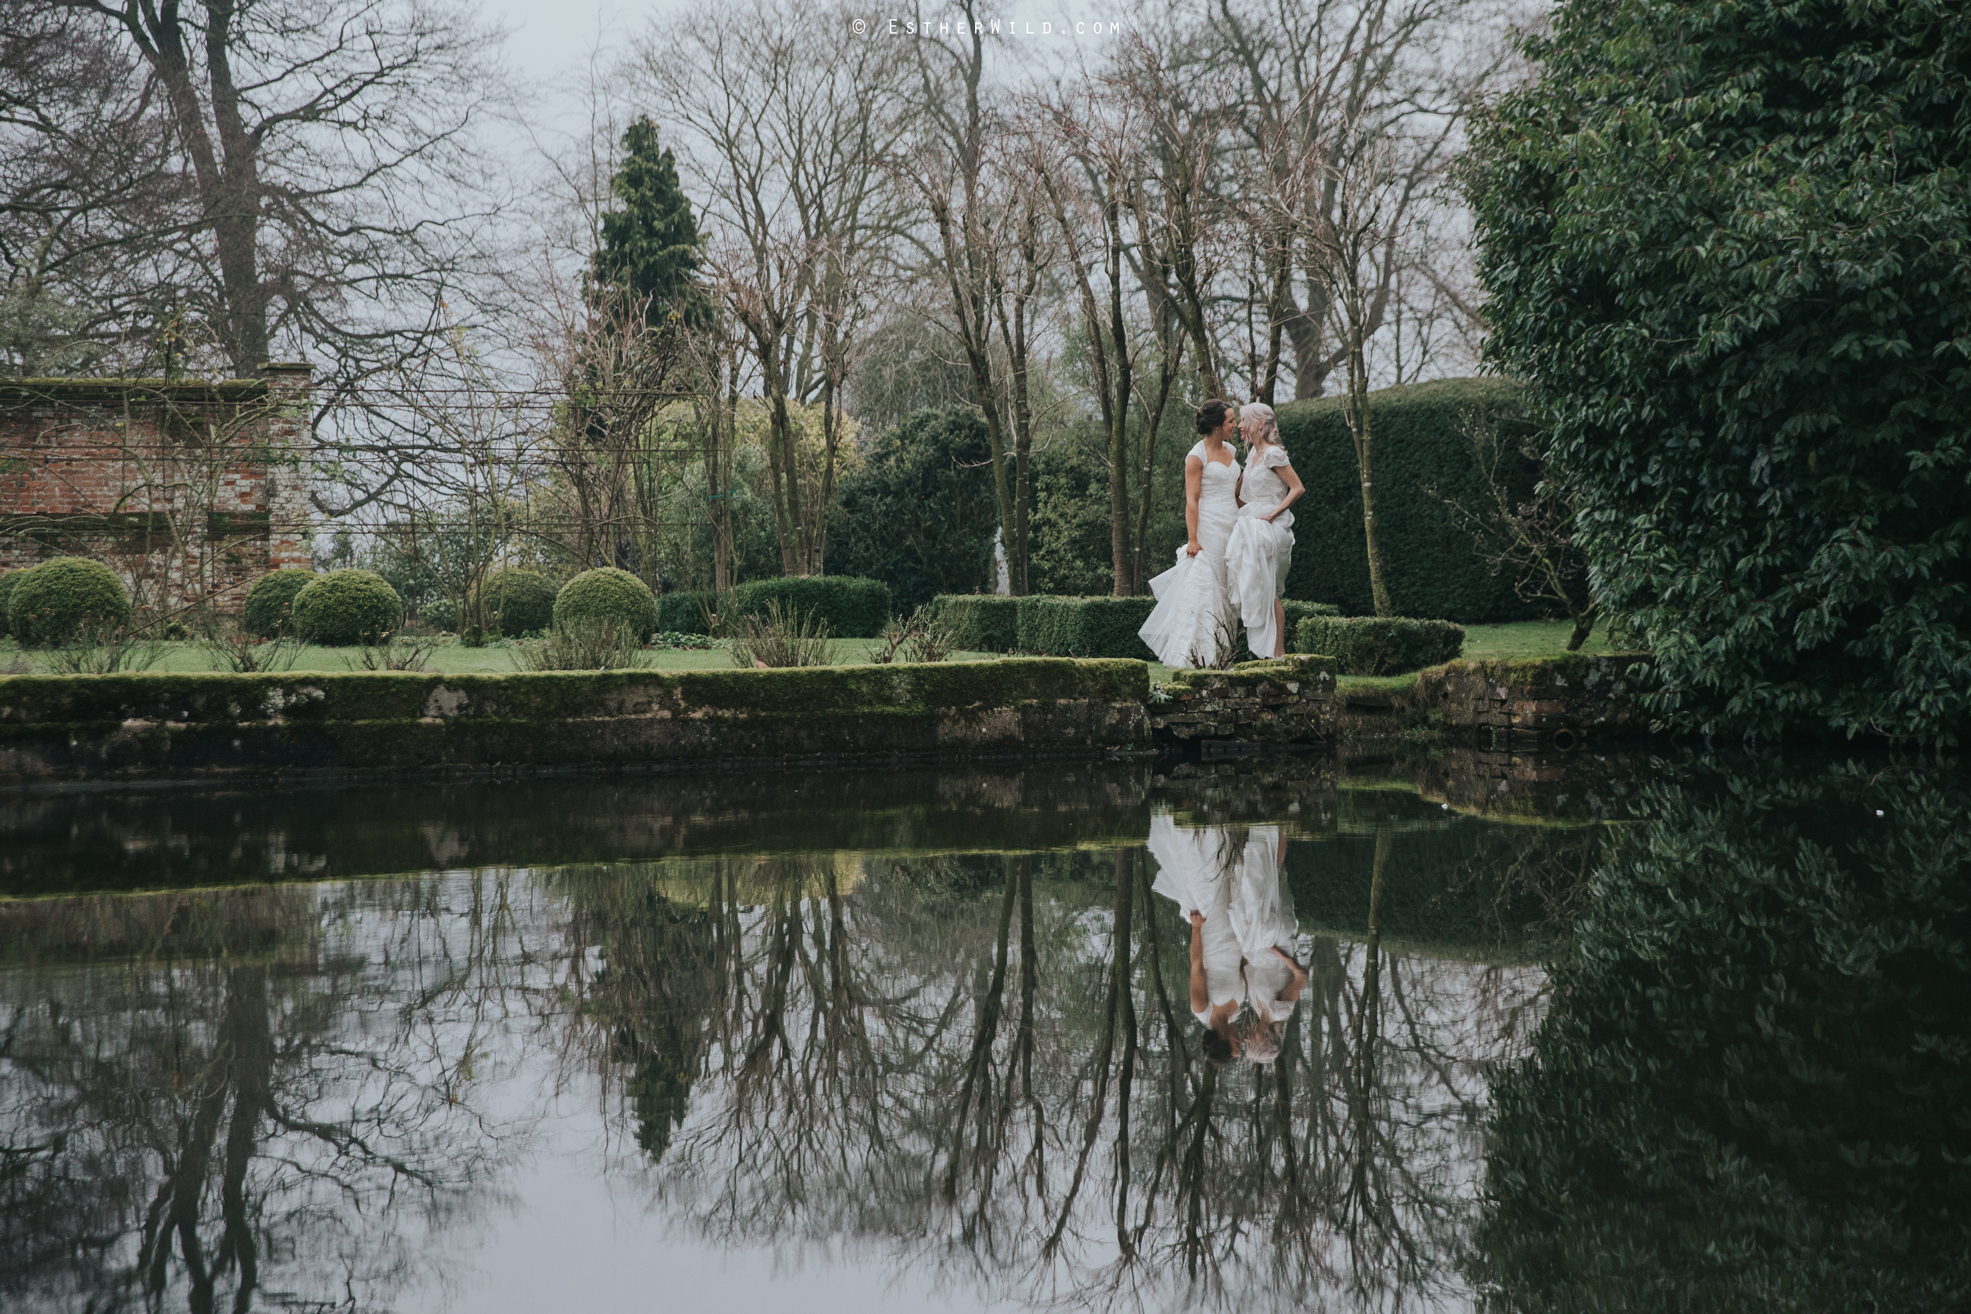 Elms_Barn_Weddings_Suffolk_Photographer_Copyright_Esther_Wild_IMG_2071.jpg